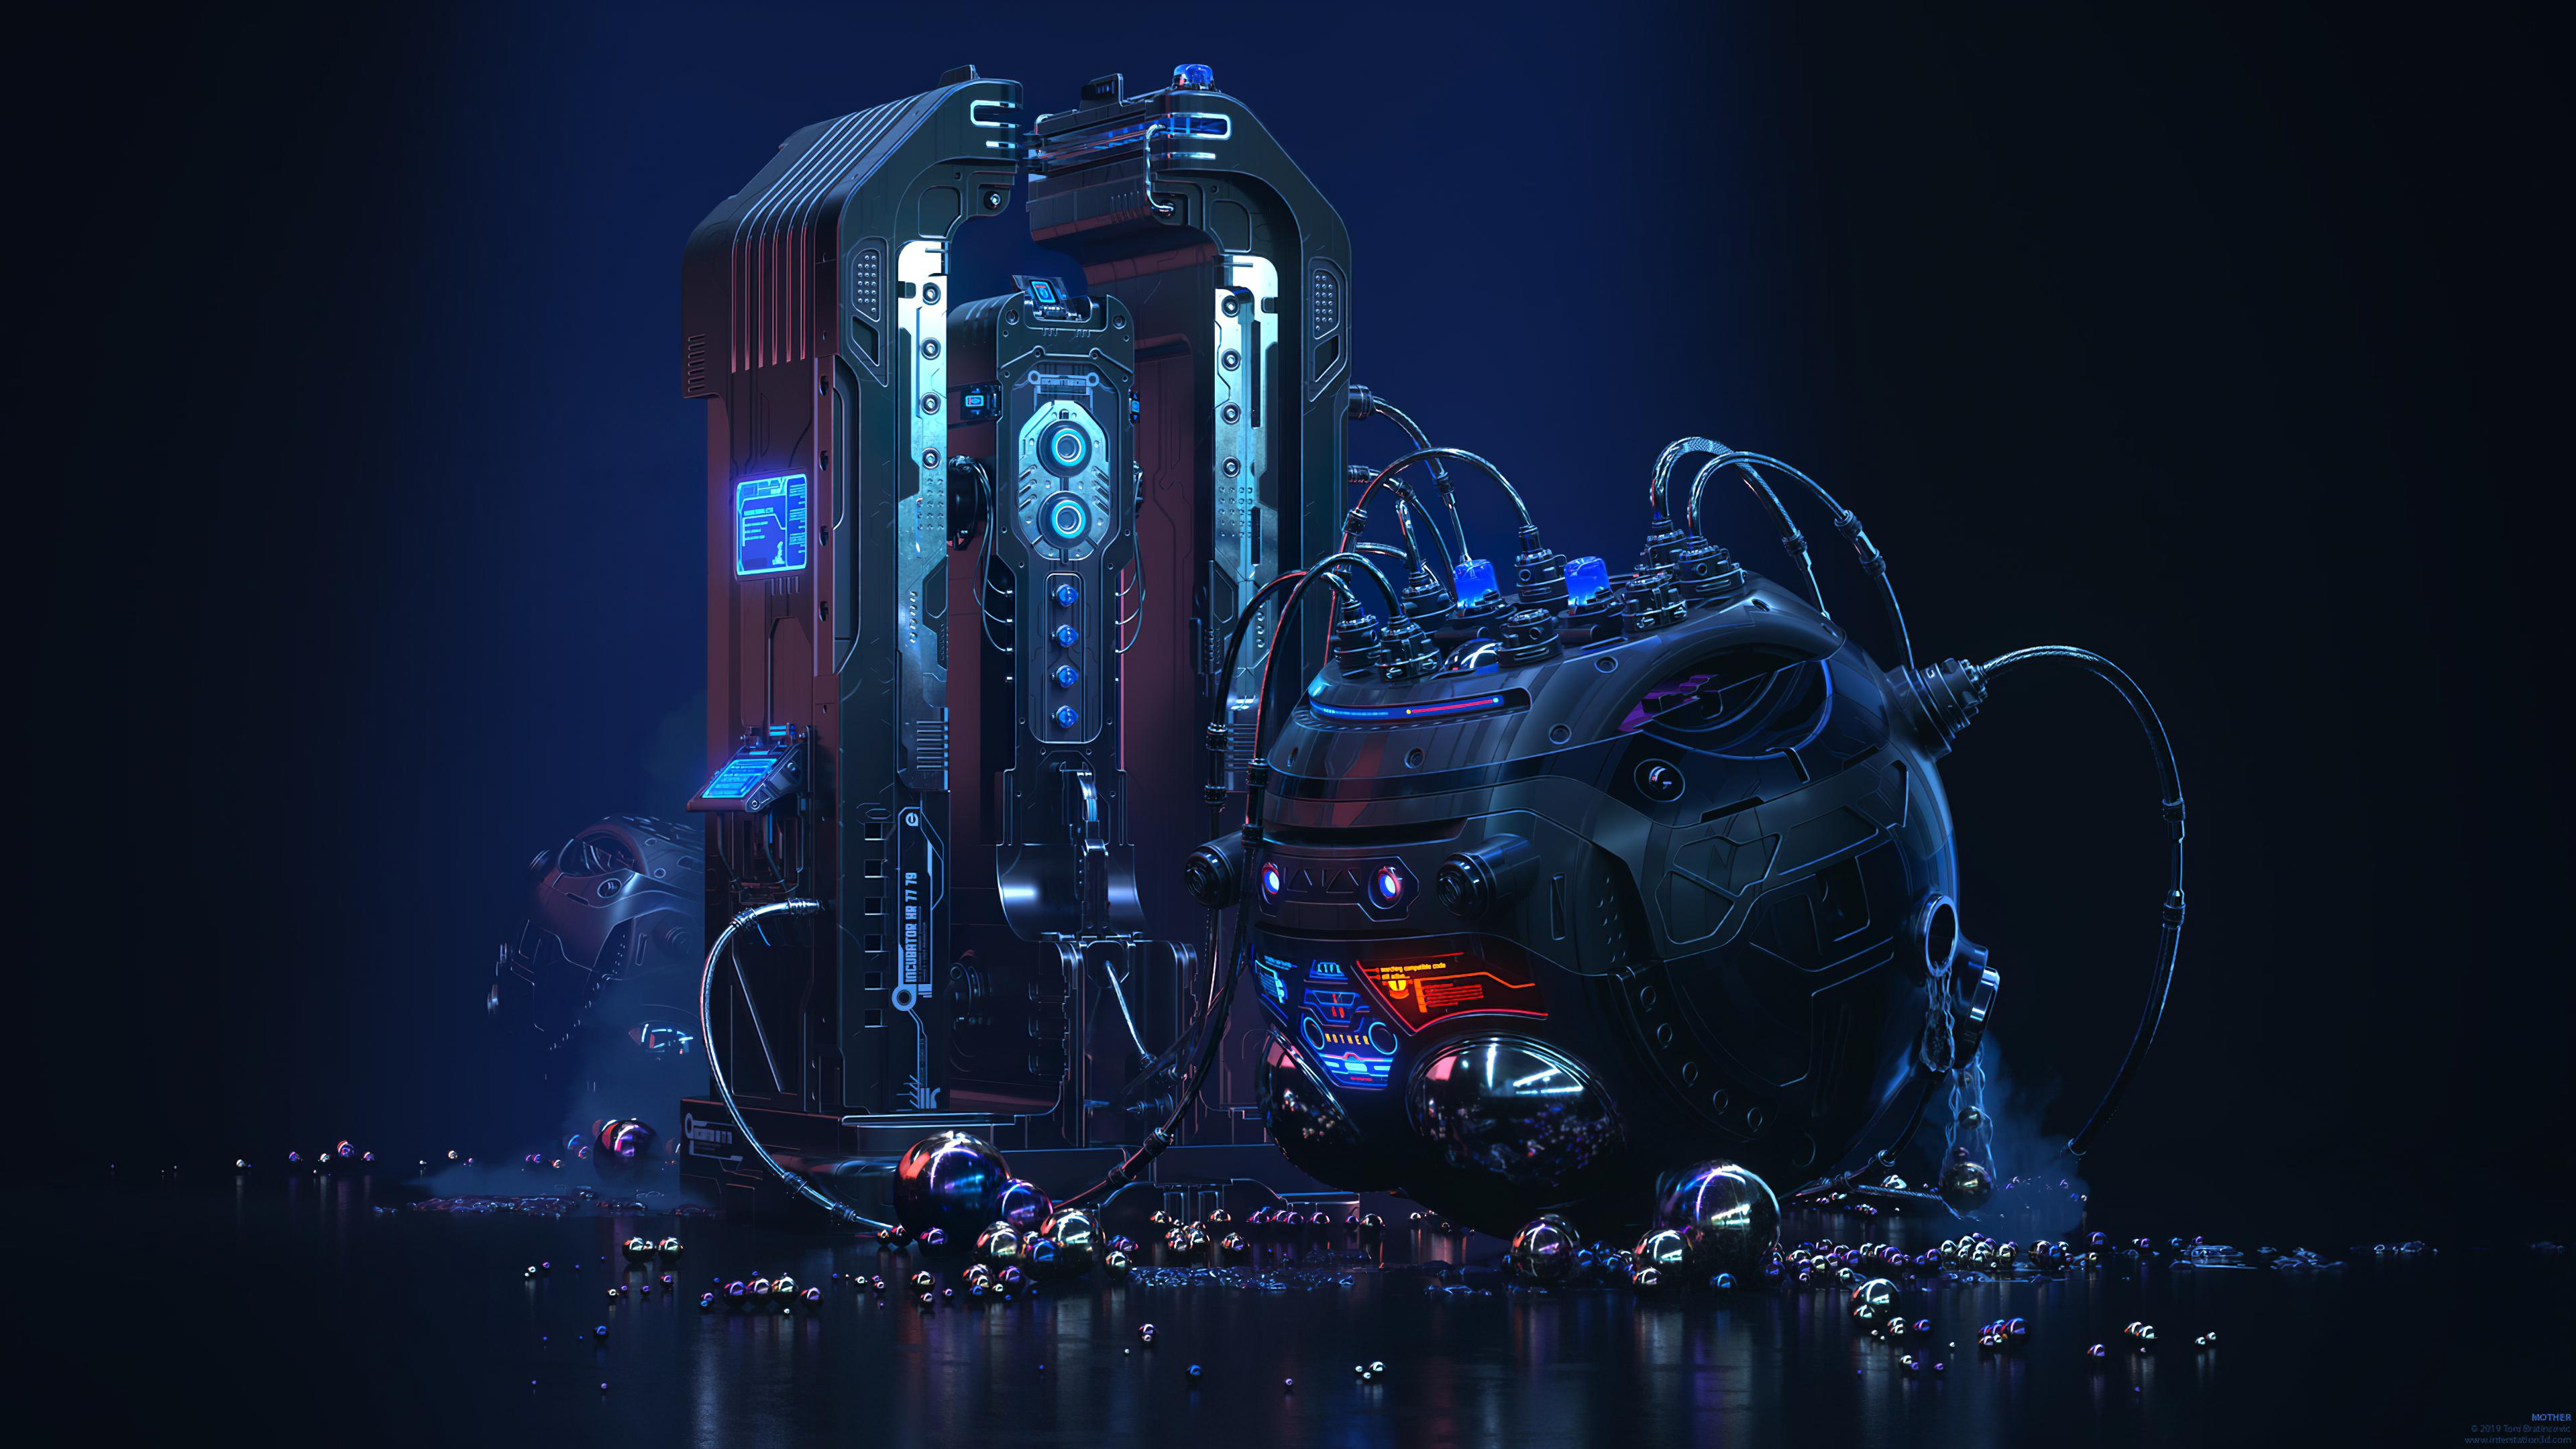 General 3840x2160 Toni Bratincevic futuristic wires machine robotics